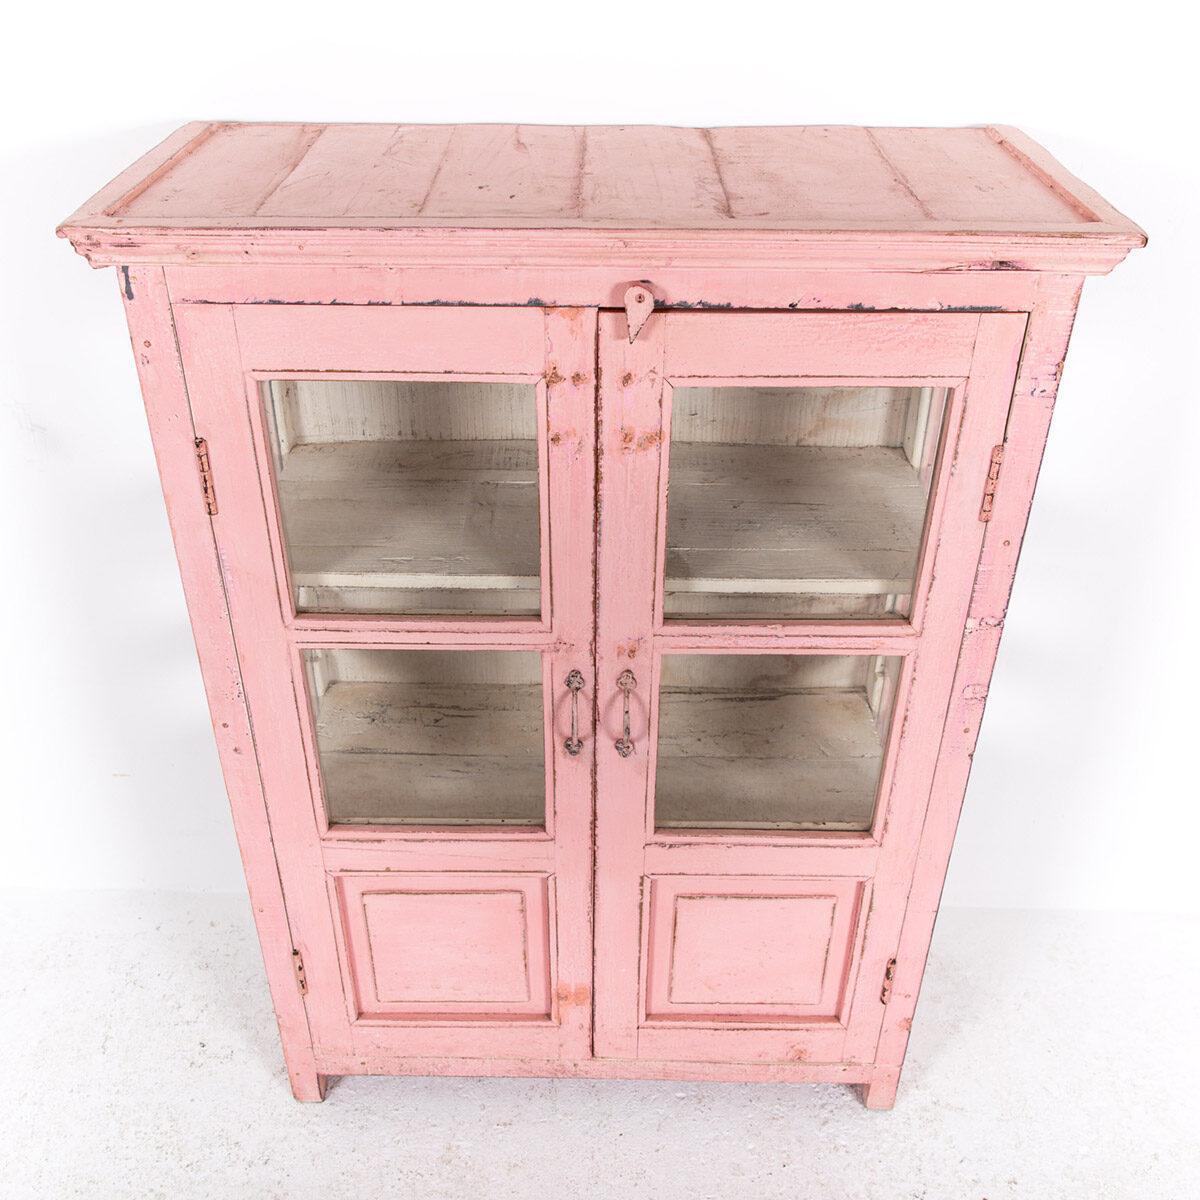 Roze-vitrinekast-2-glazen-deuren-10